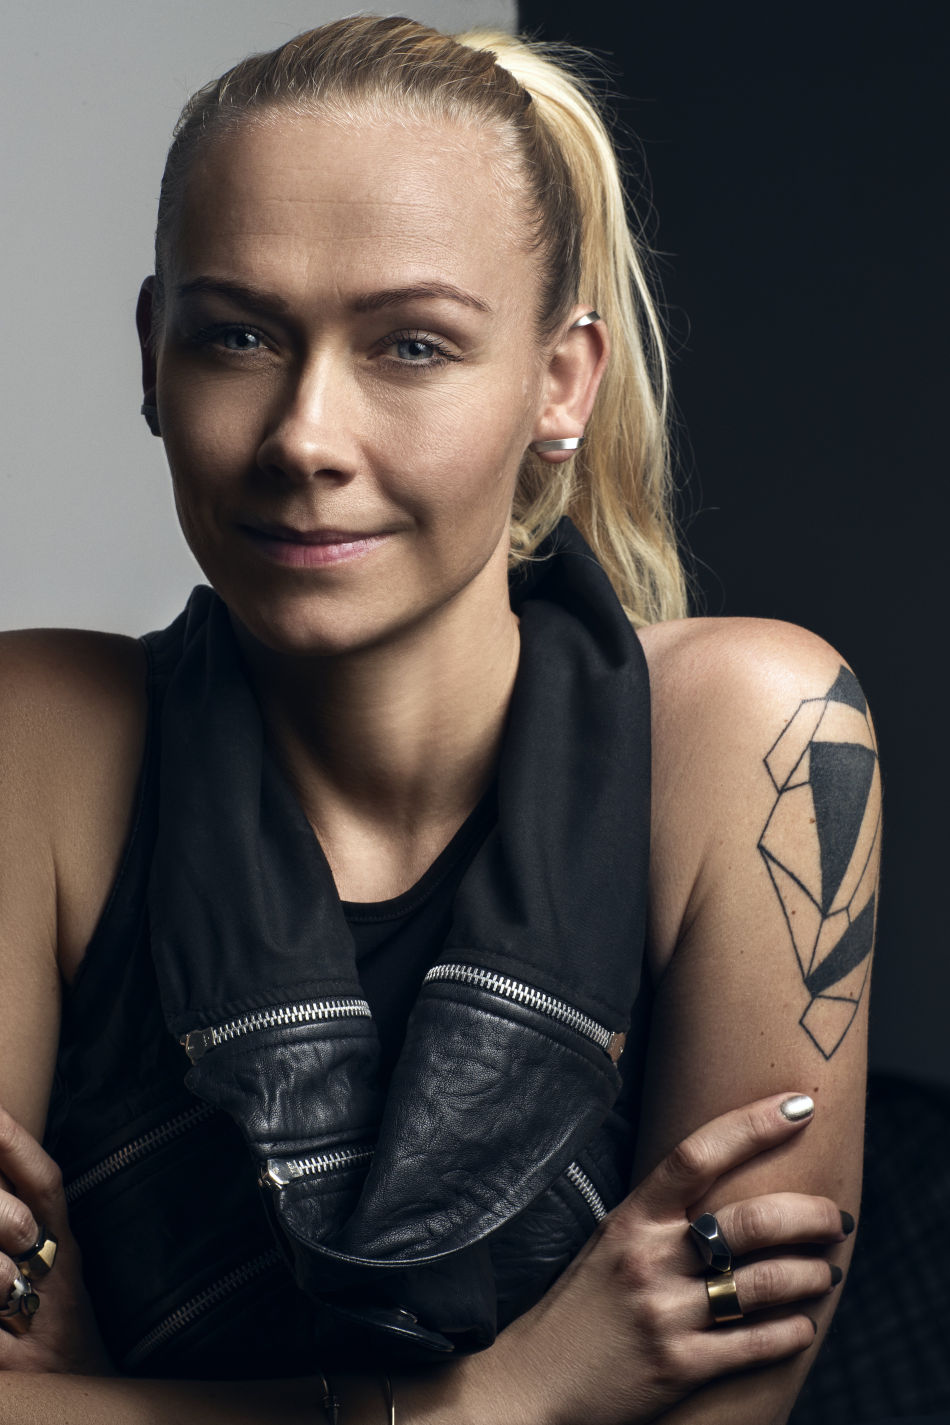 Stinne Holm